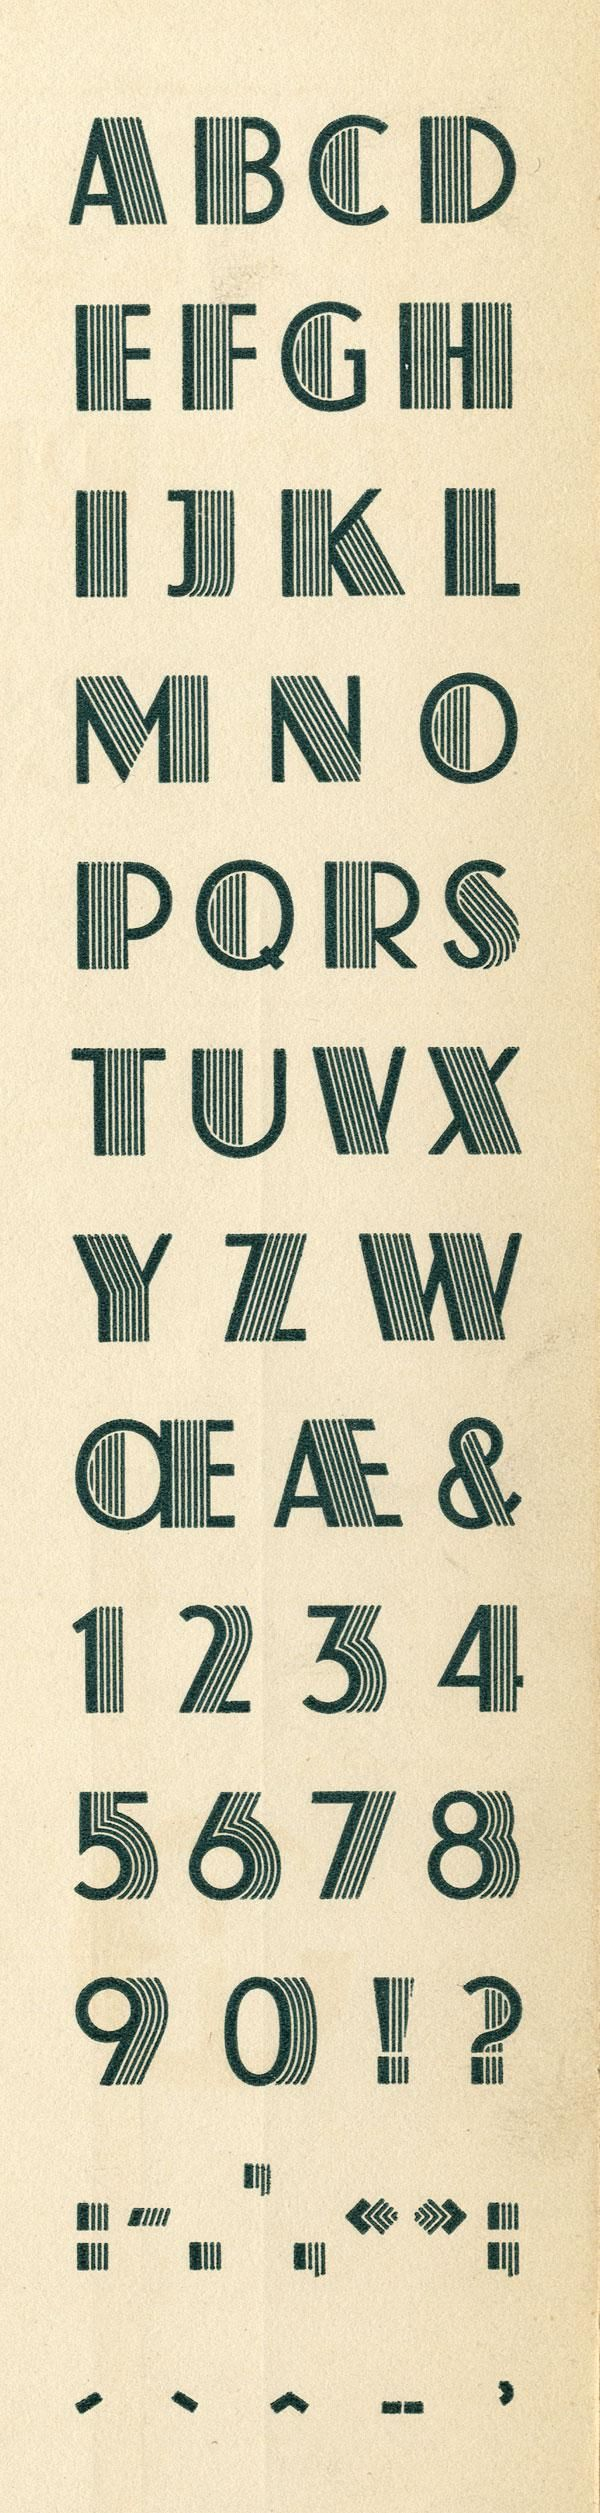 Atlas Exemple, Schaeffer, K. H., Fonderie Typographique Française #typography